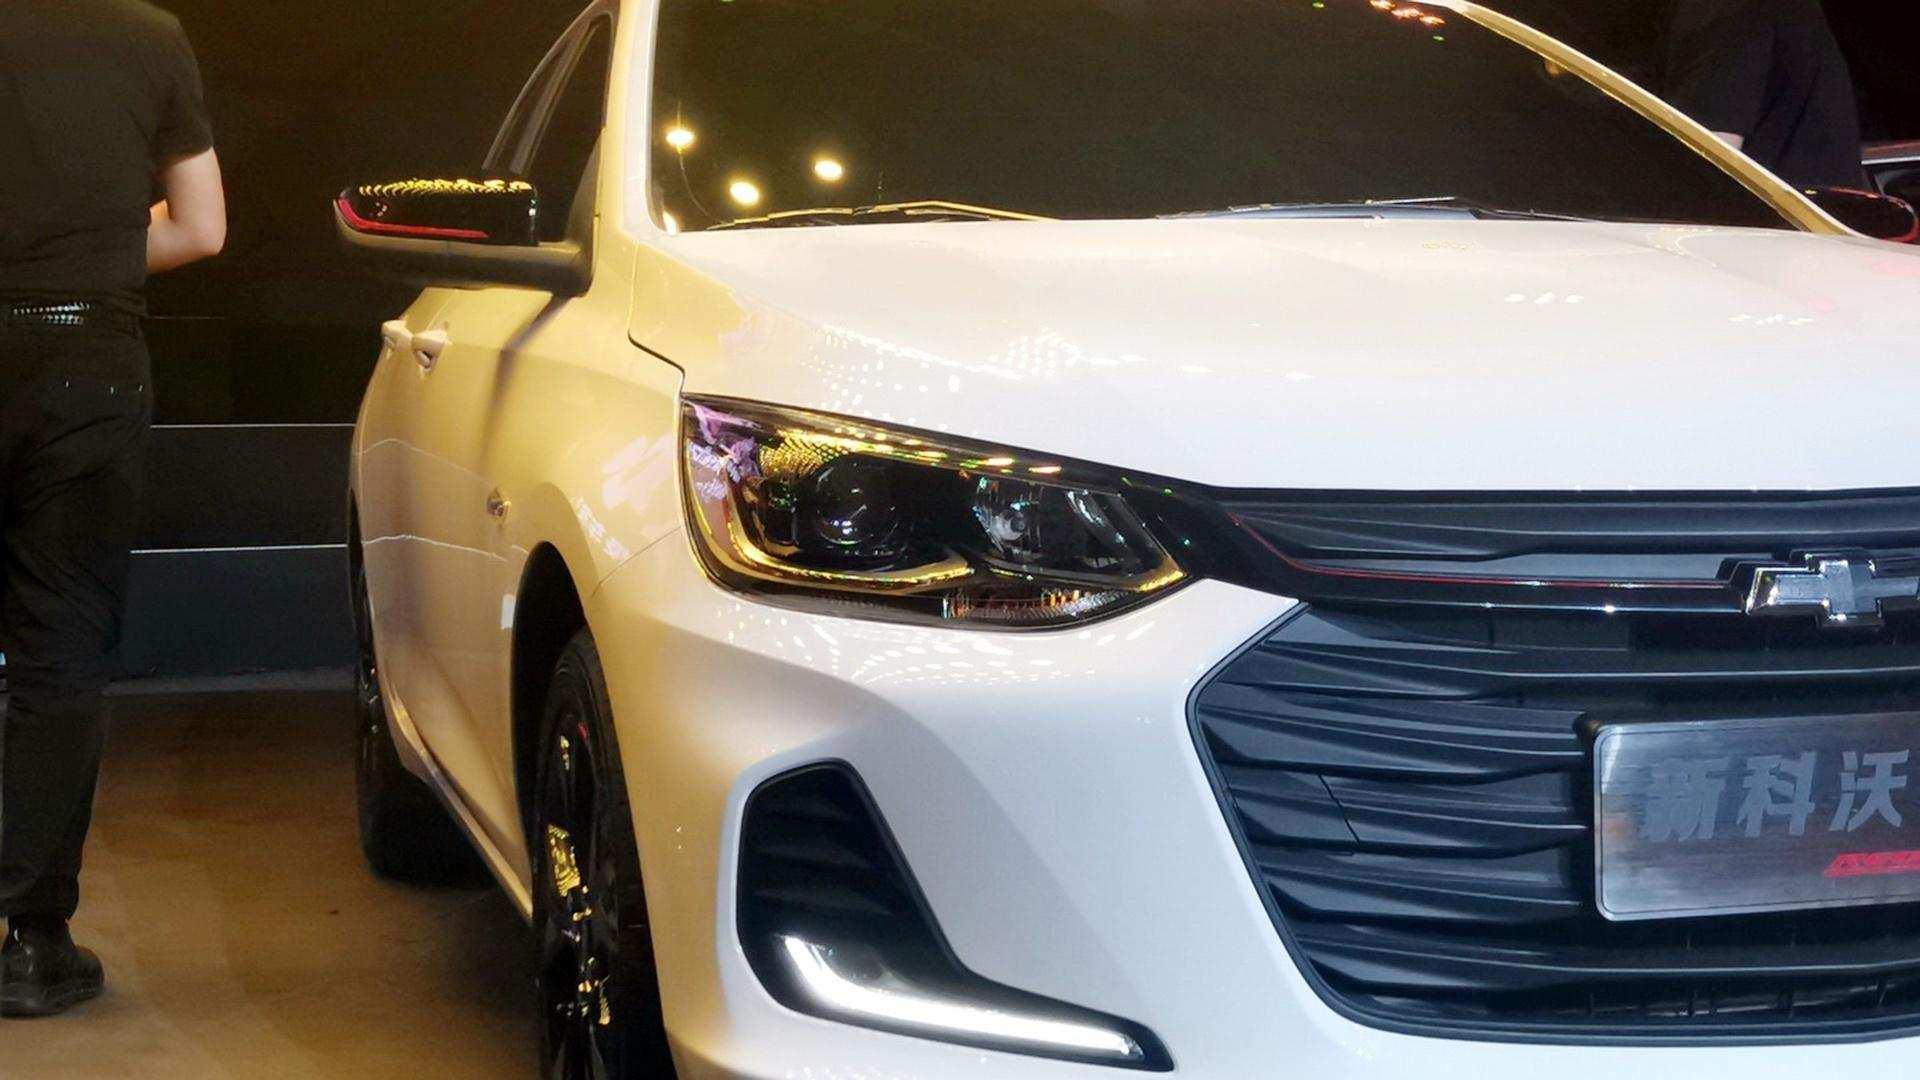 75 New Chevrolet Novo Prisma 2020 Performance and New Engine with Chevrolet Novo Prisma 2020